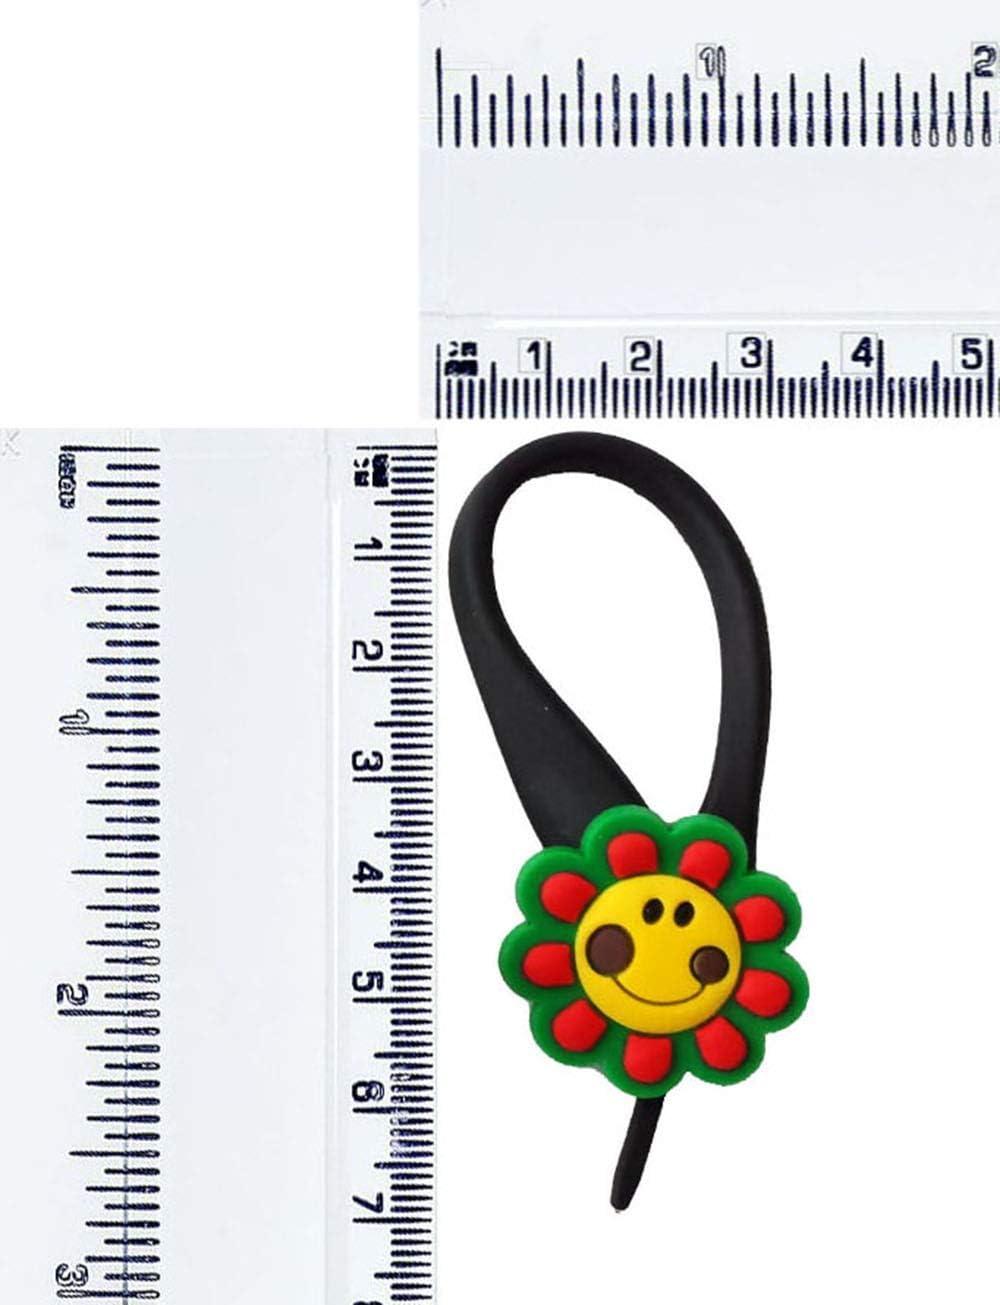 Zipper Pull Set of 6 Pcs